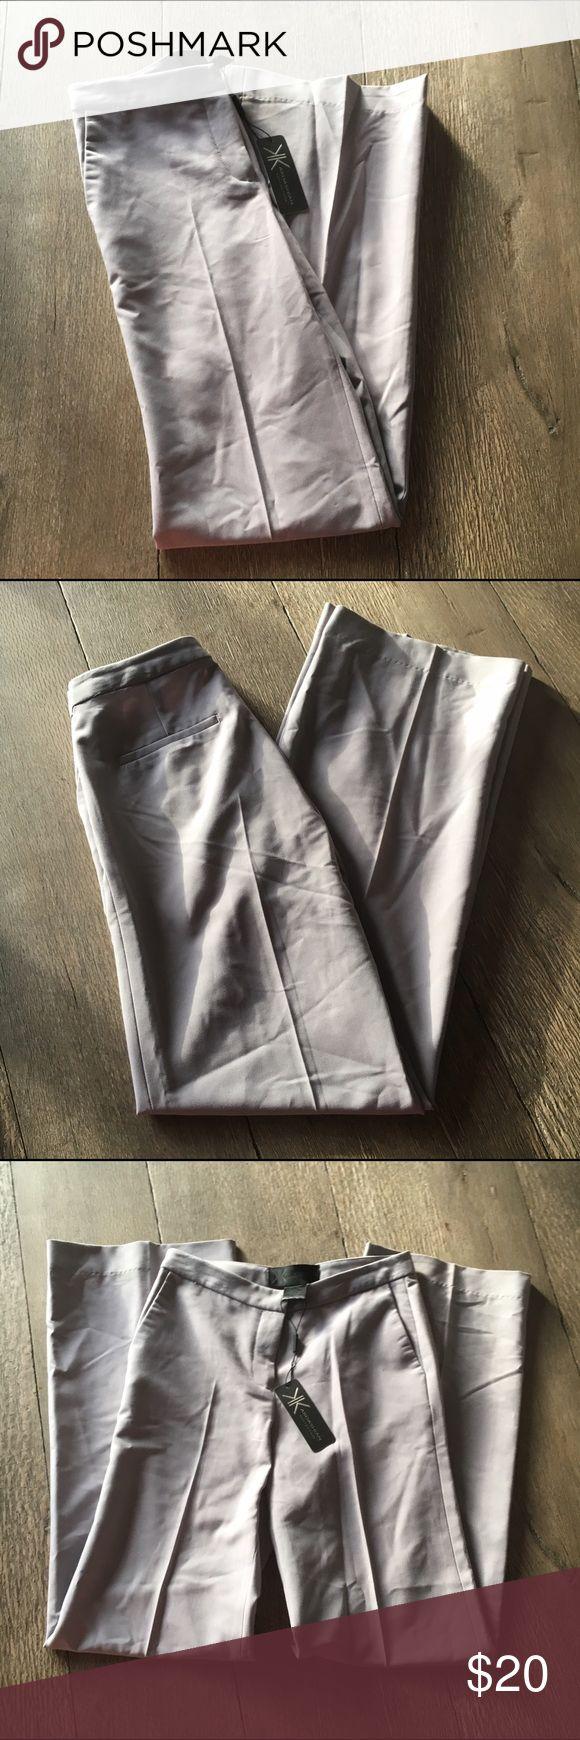 "Kardashian Kollection Bell Dress Pants Kardashian Kollection Bell Dress Pants. Waist is 14"" laid flat. 32"" inseam. Front pockets. Faux back pockets. Kardashian Kollection Pants Trousers"